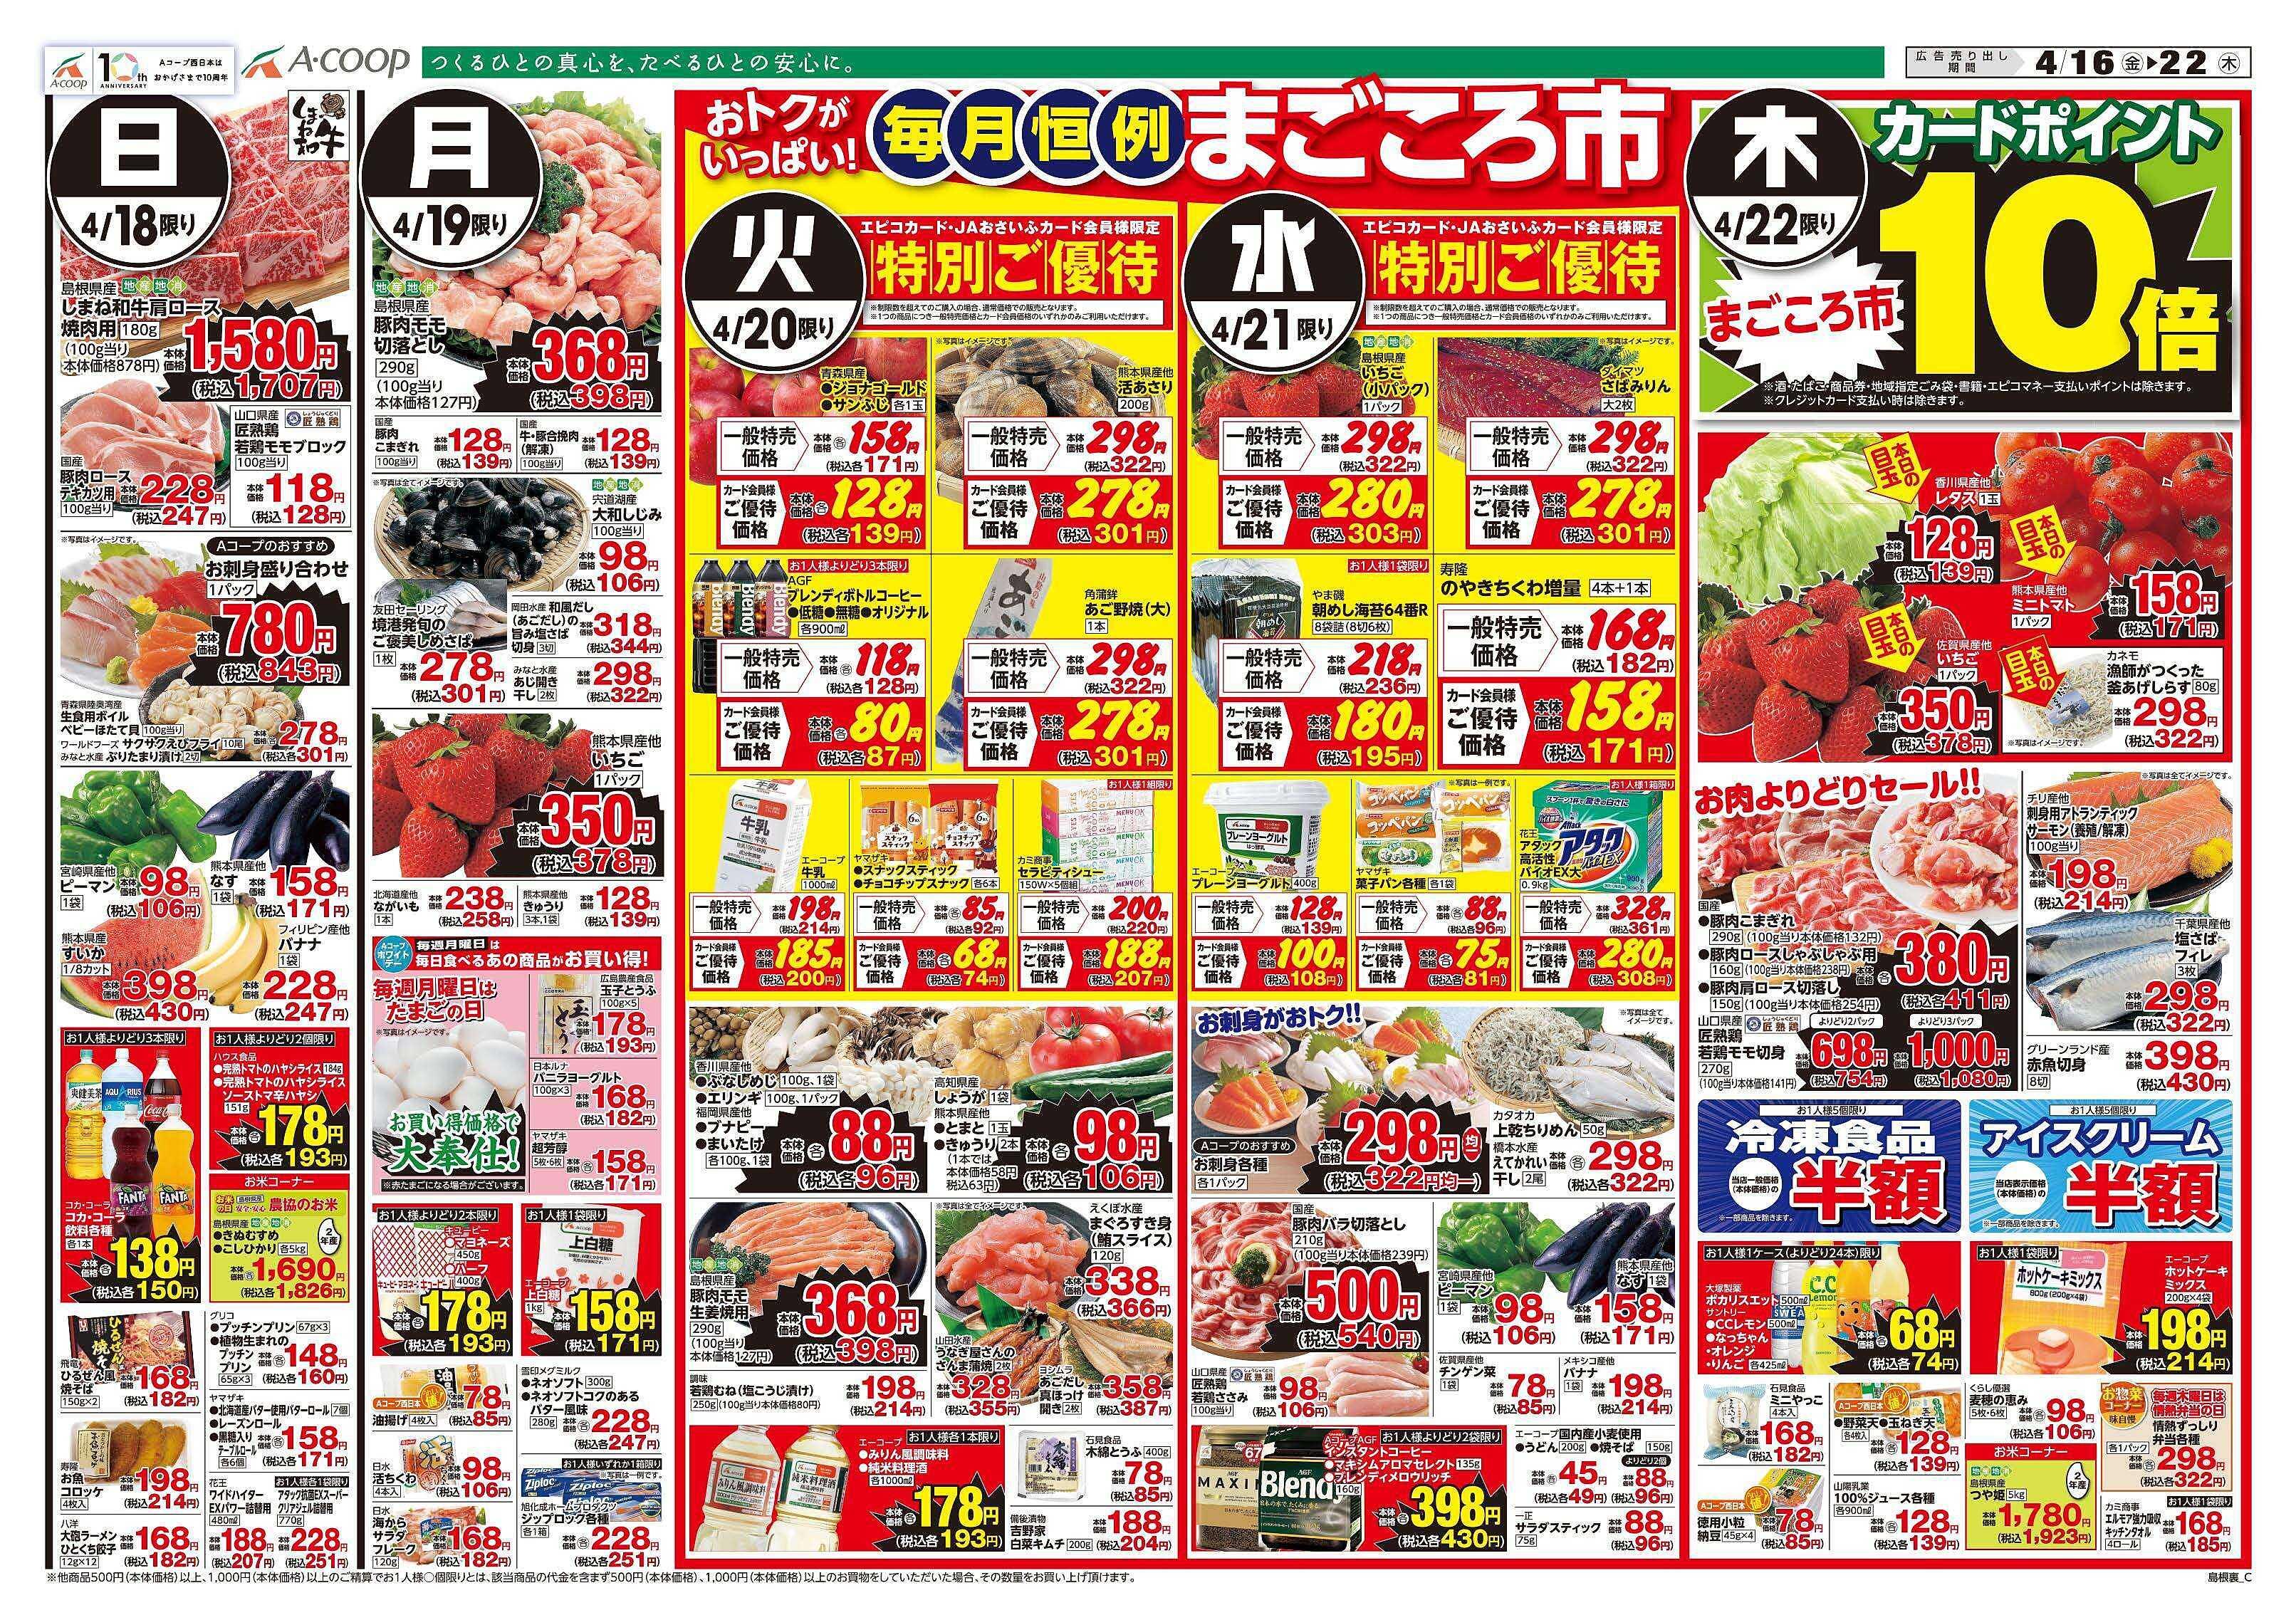 Aコープ西日本 4/16(金)~4/22(木)